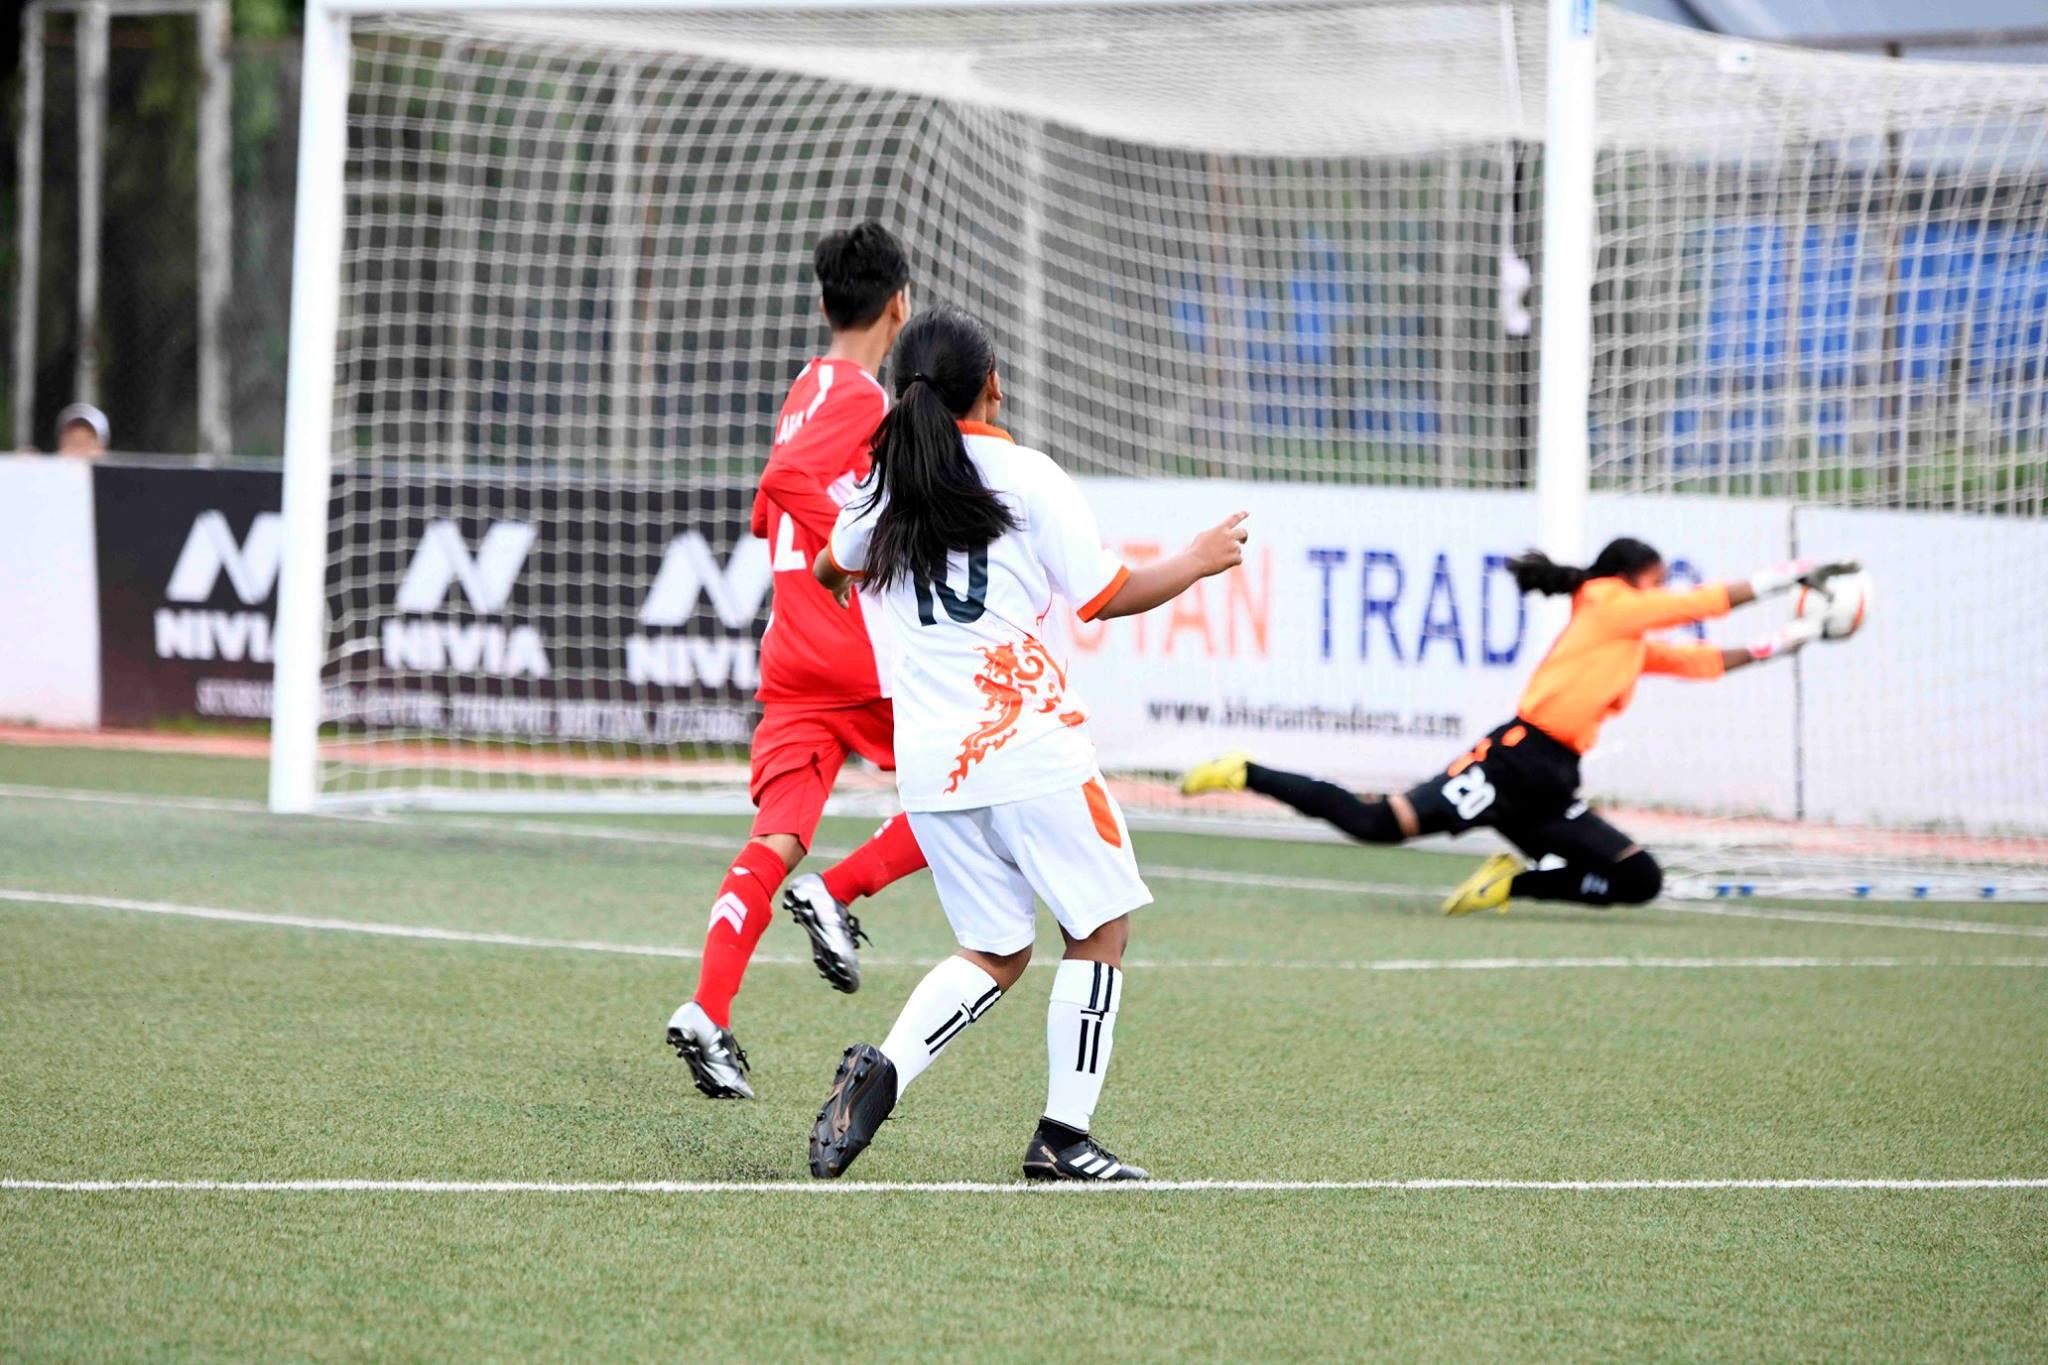 Nadezhda Cup Women Football: Nepal defeated to Uzbekistan